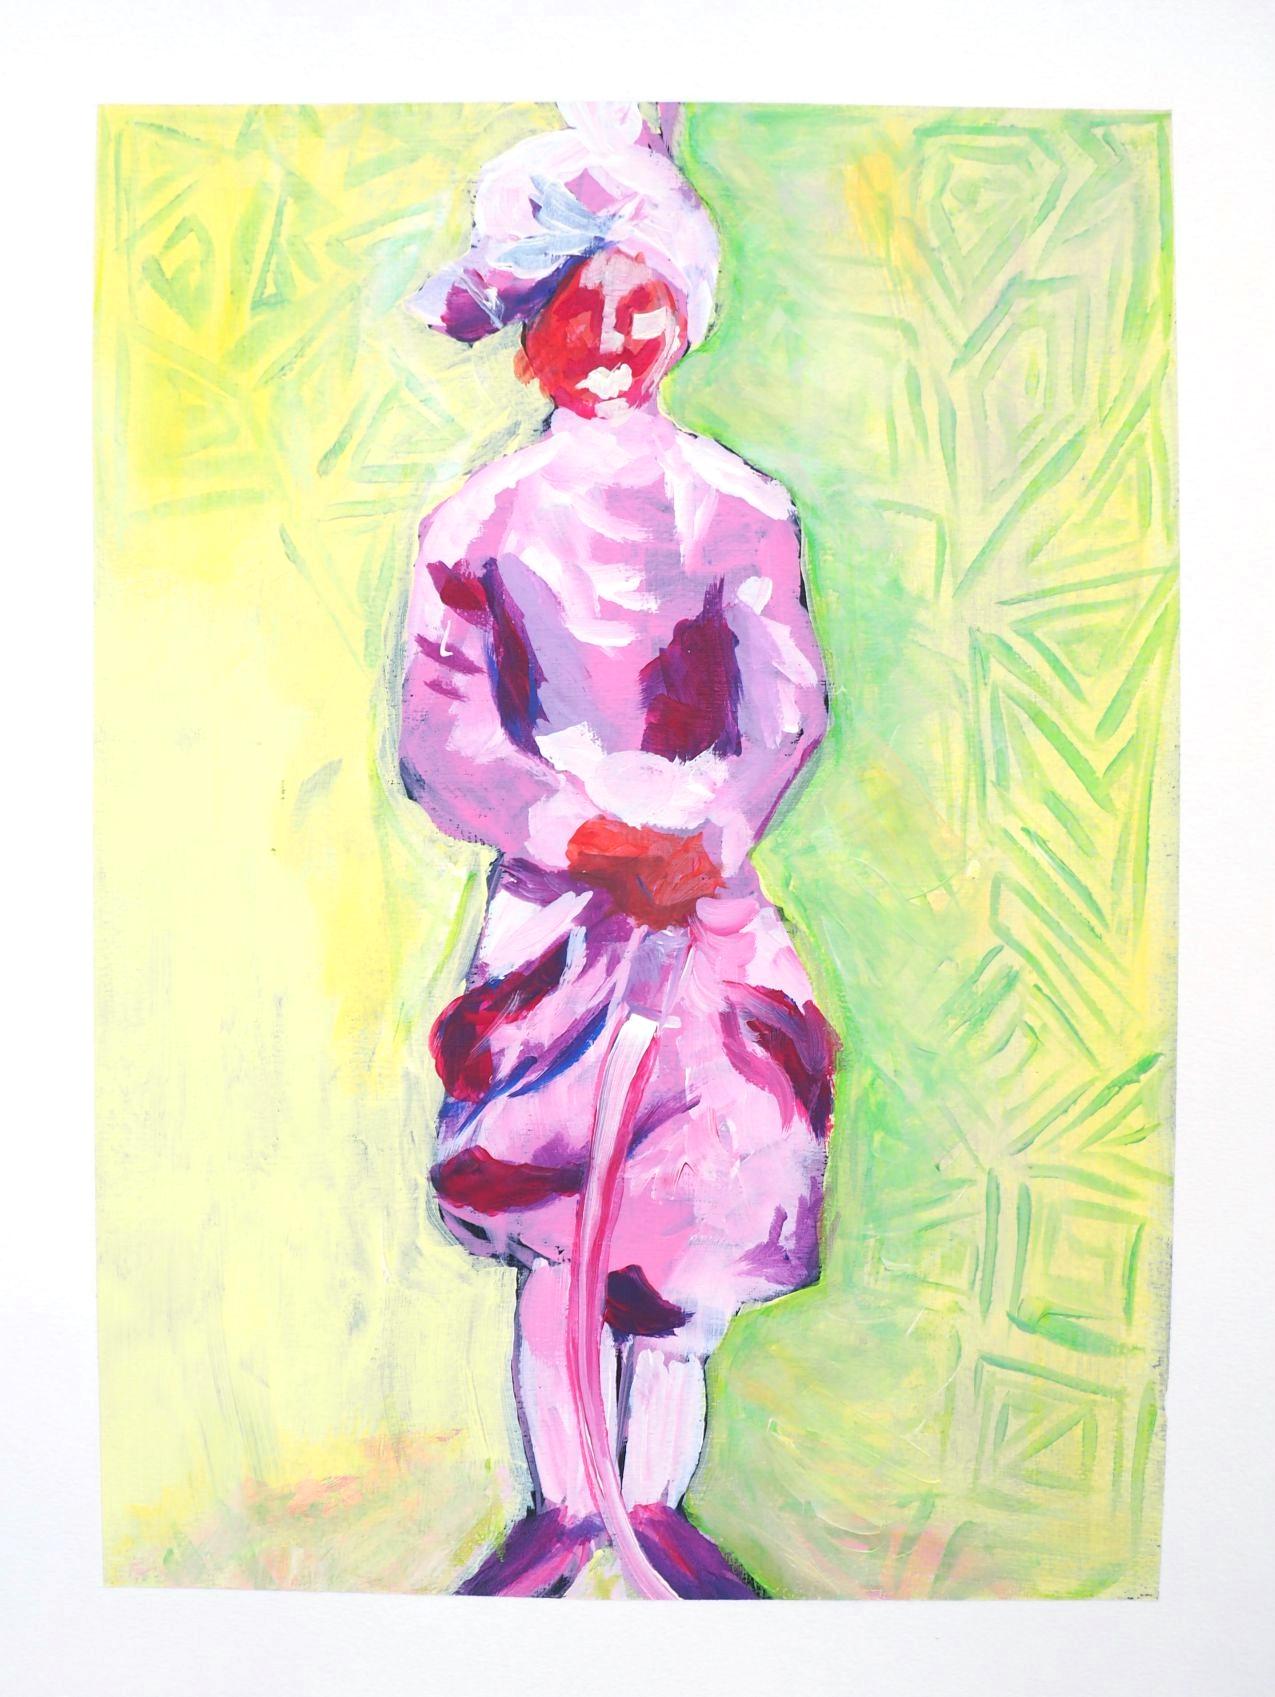 Pink Maharaja, 20 3/4 x 18 3/4, acrylic on paper, $150